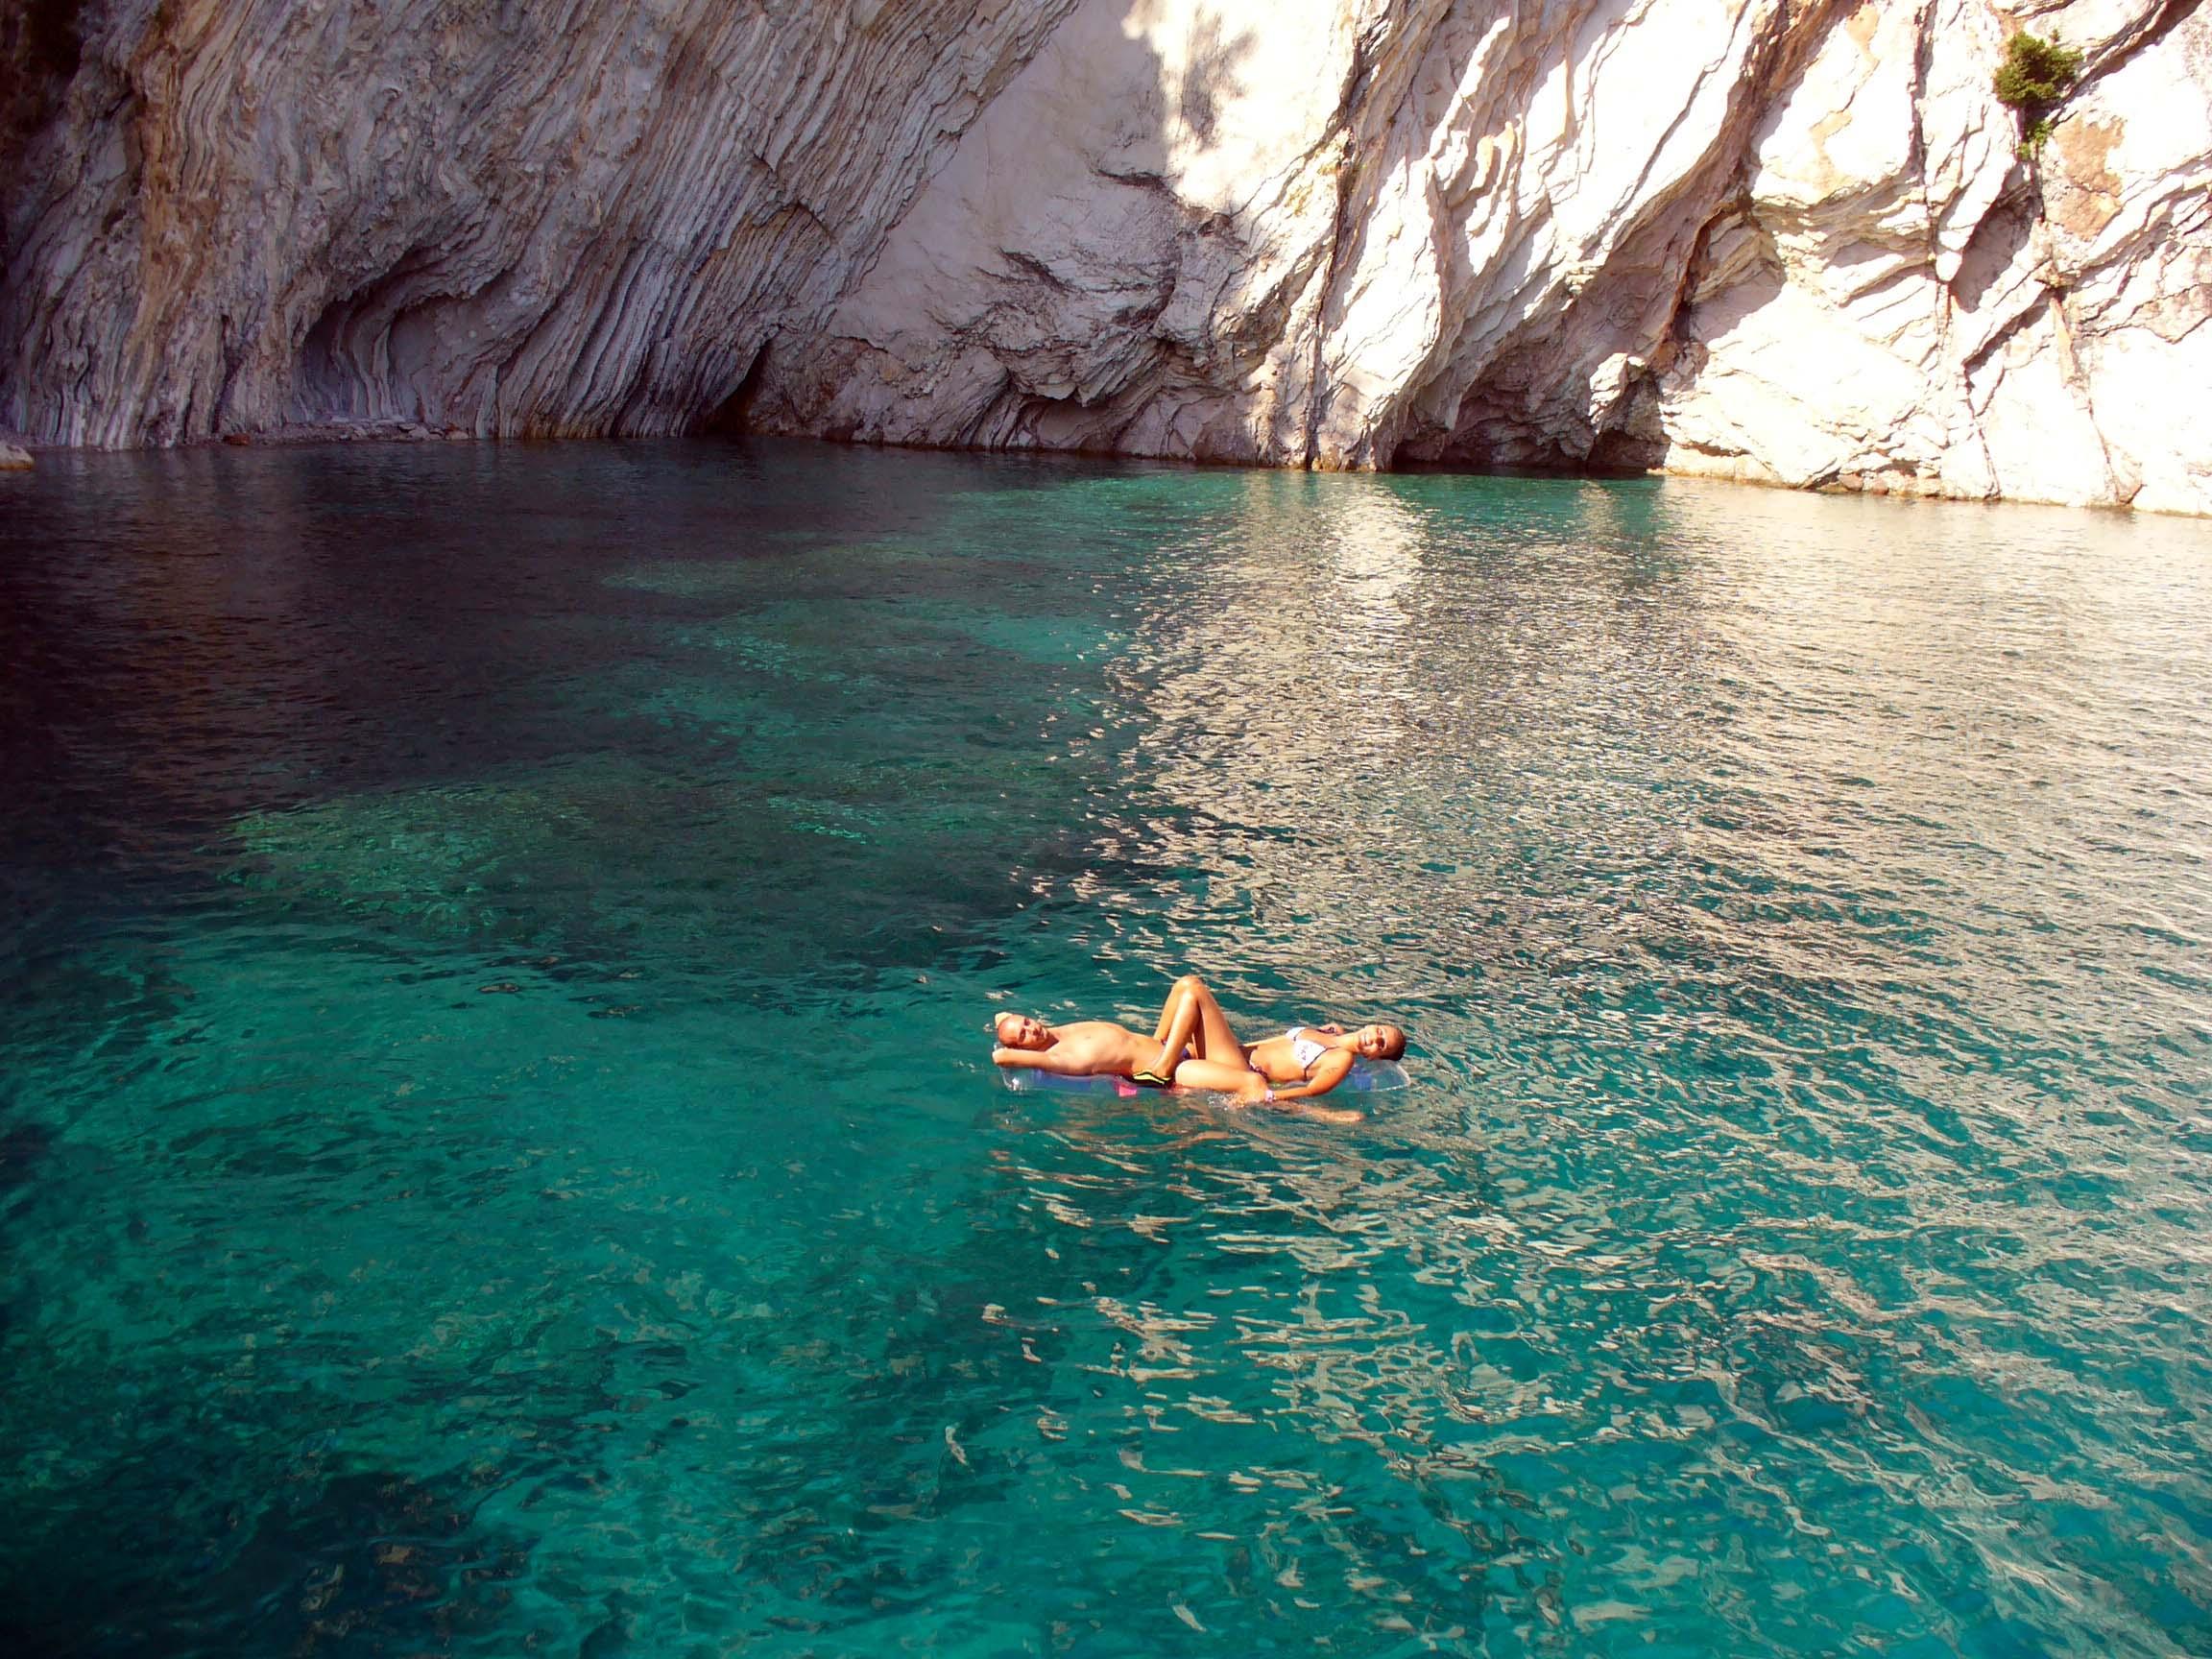 Grecia 2016, crociere in barca a vela